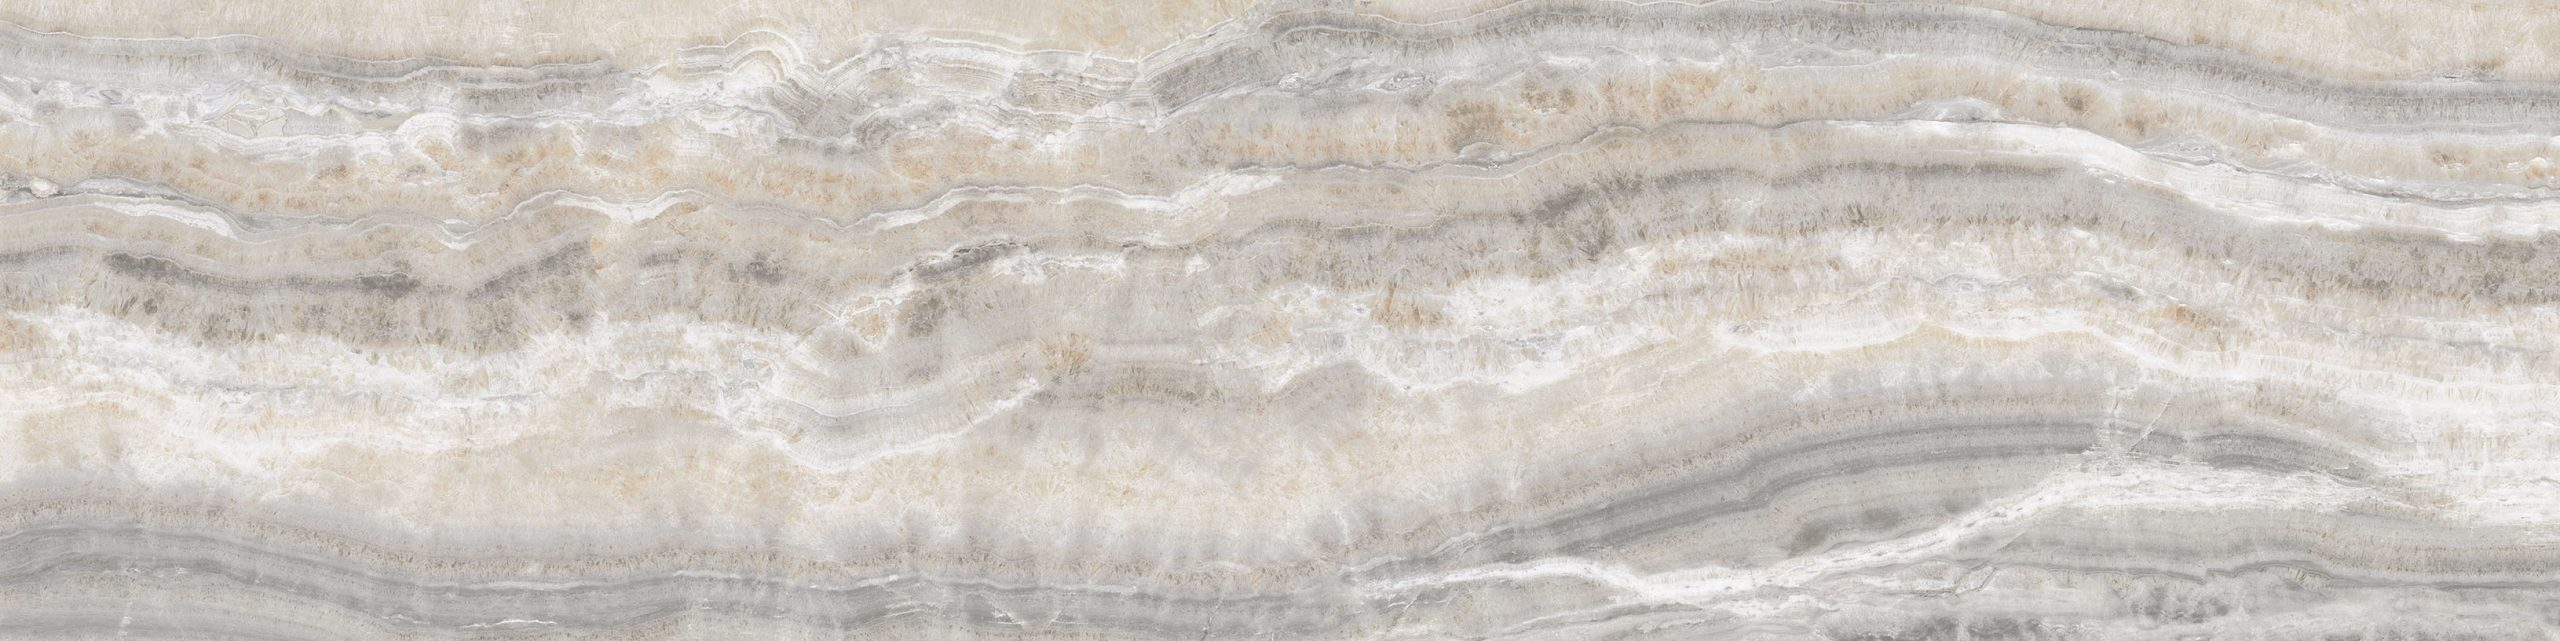 Onyx of Cerim Cloud Glossy 10mm 30 x 120